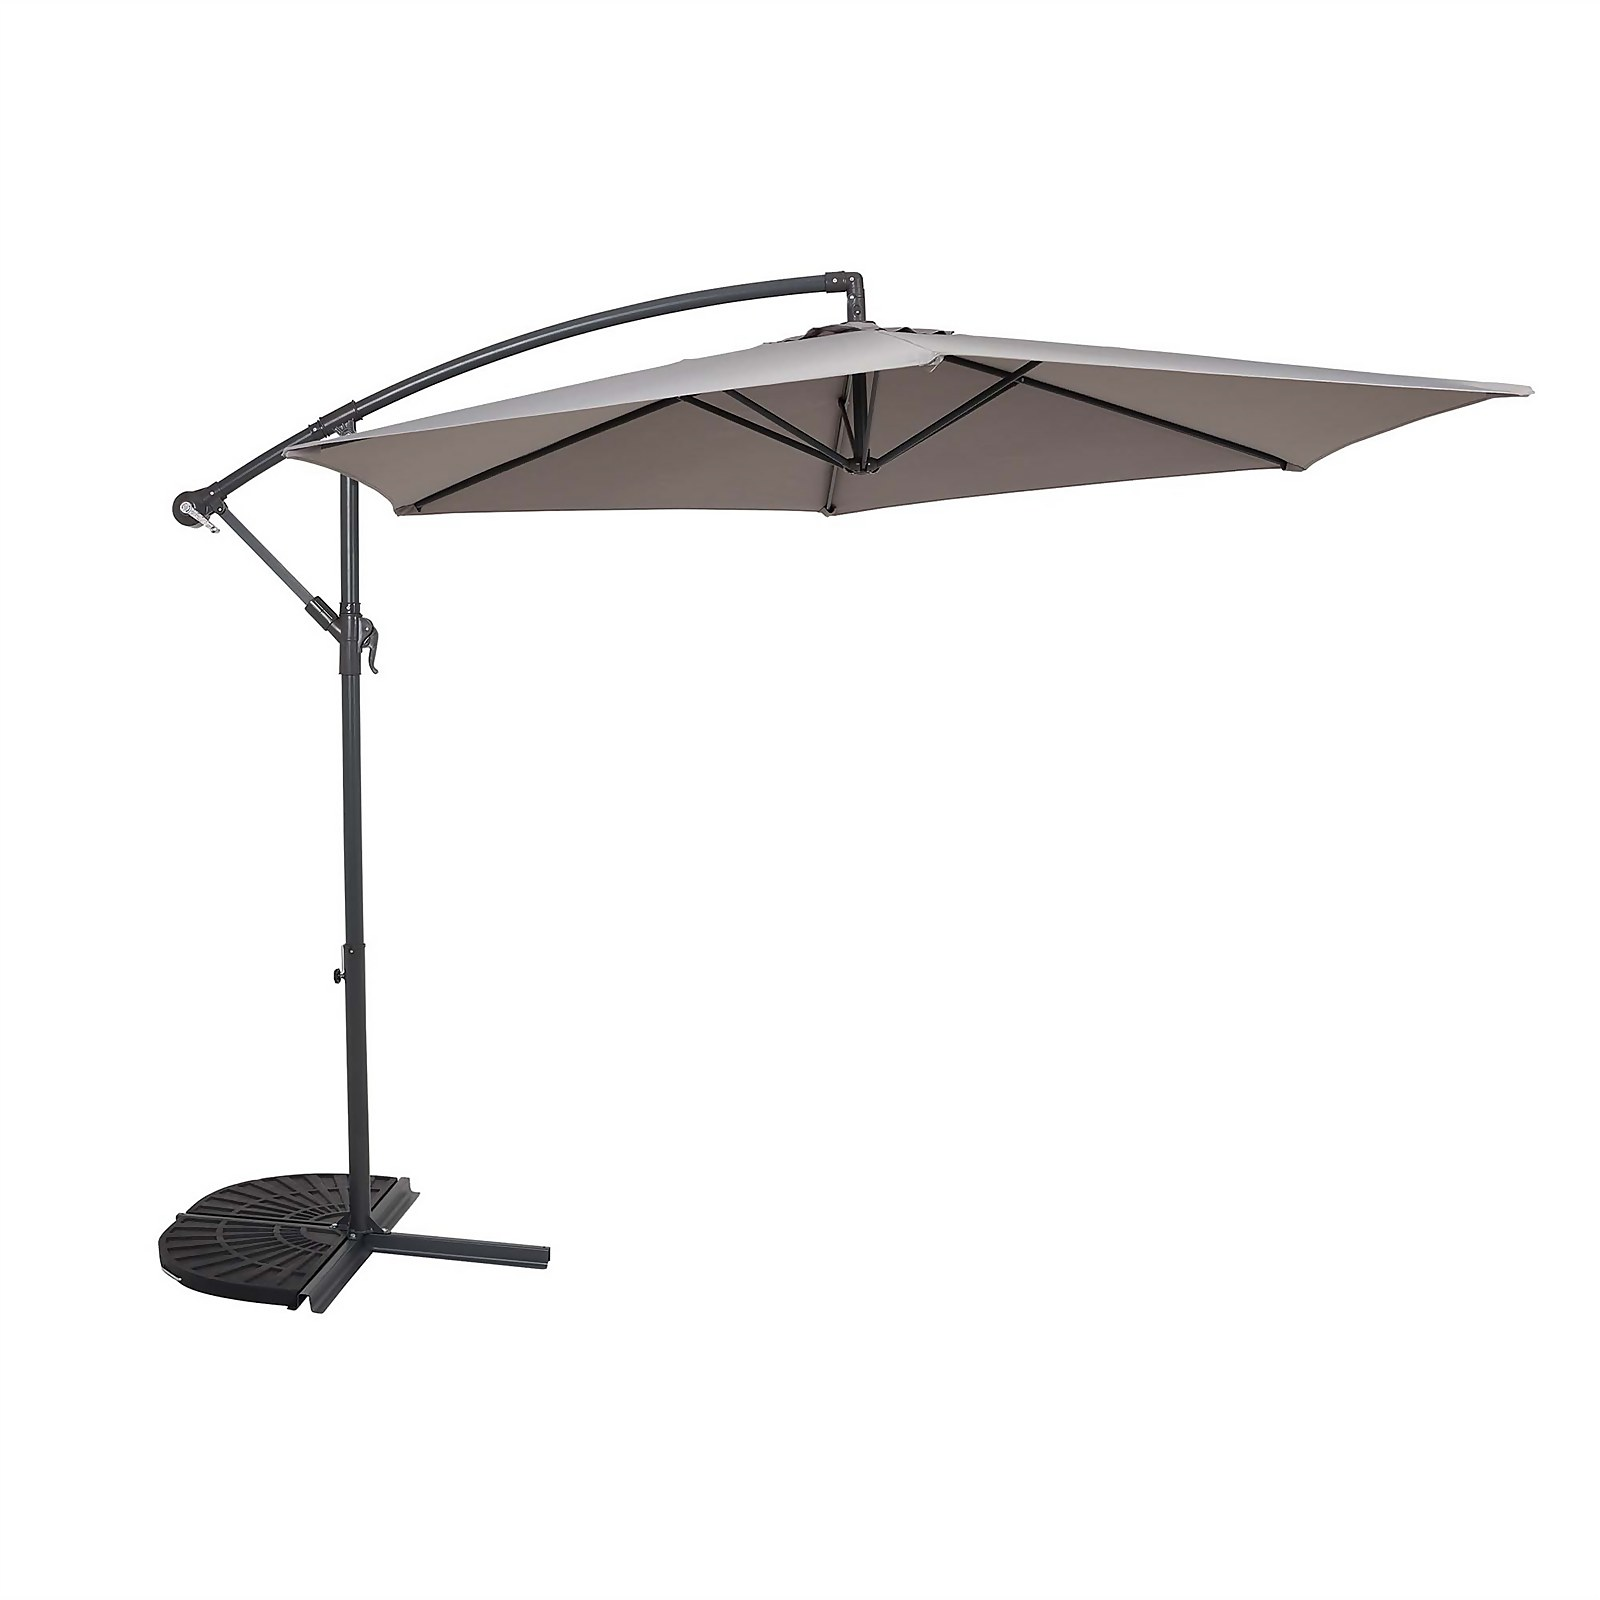 Parasol 3m Overhanging - Light Grey - Dia. 48mm